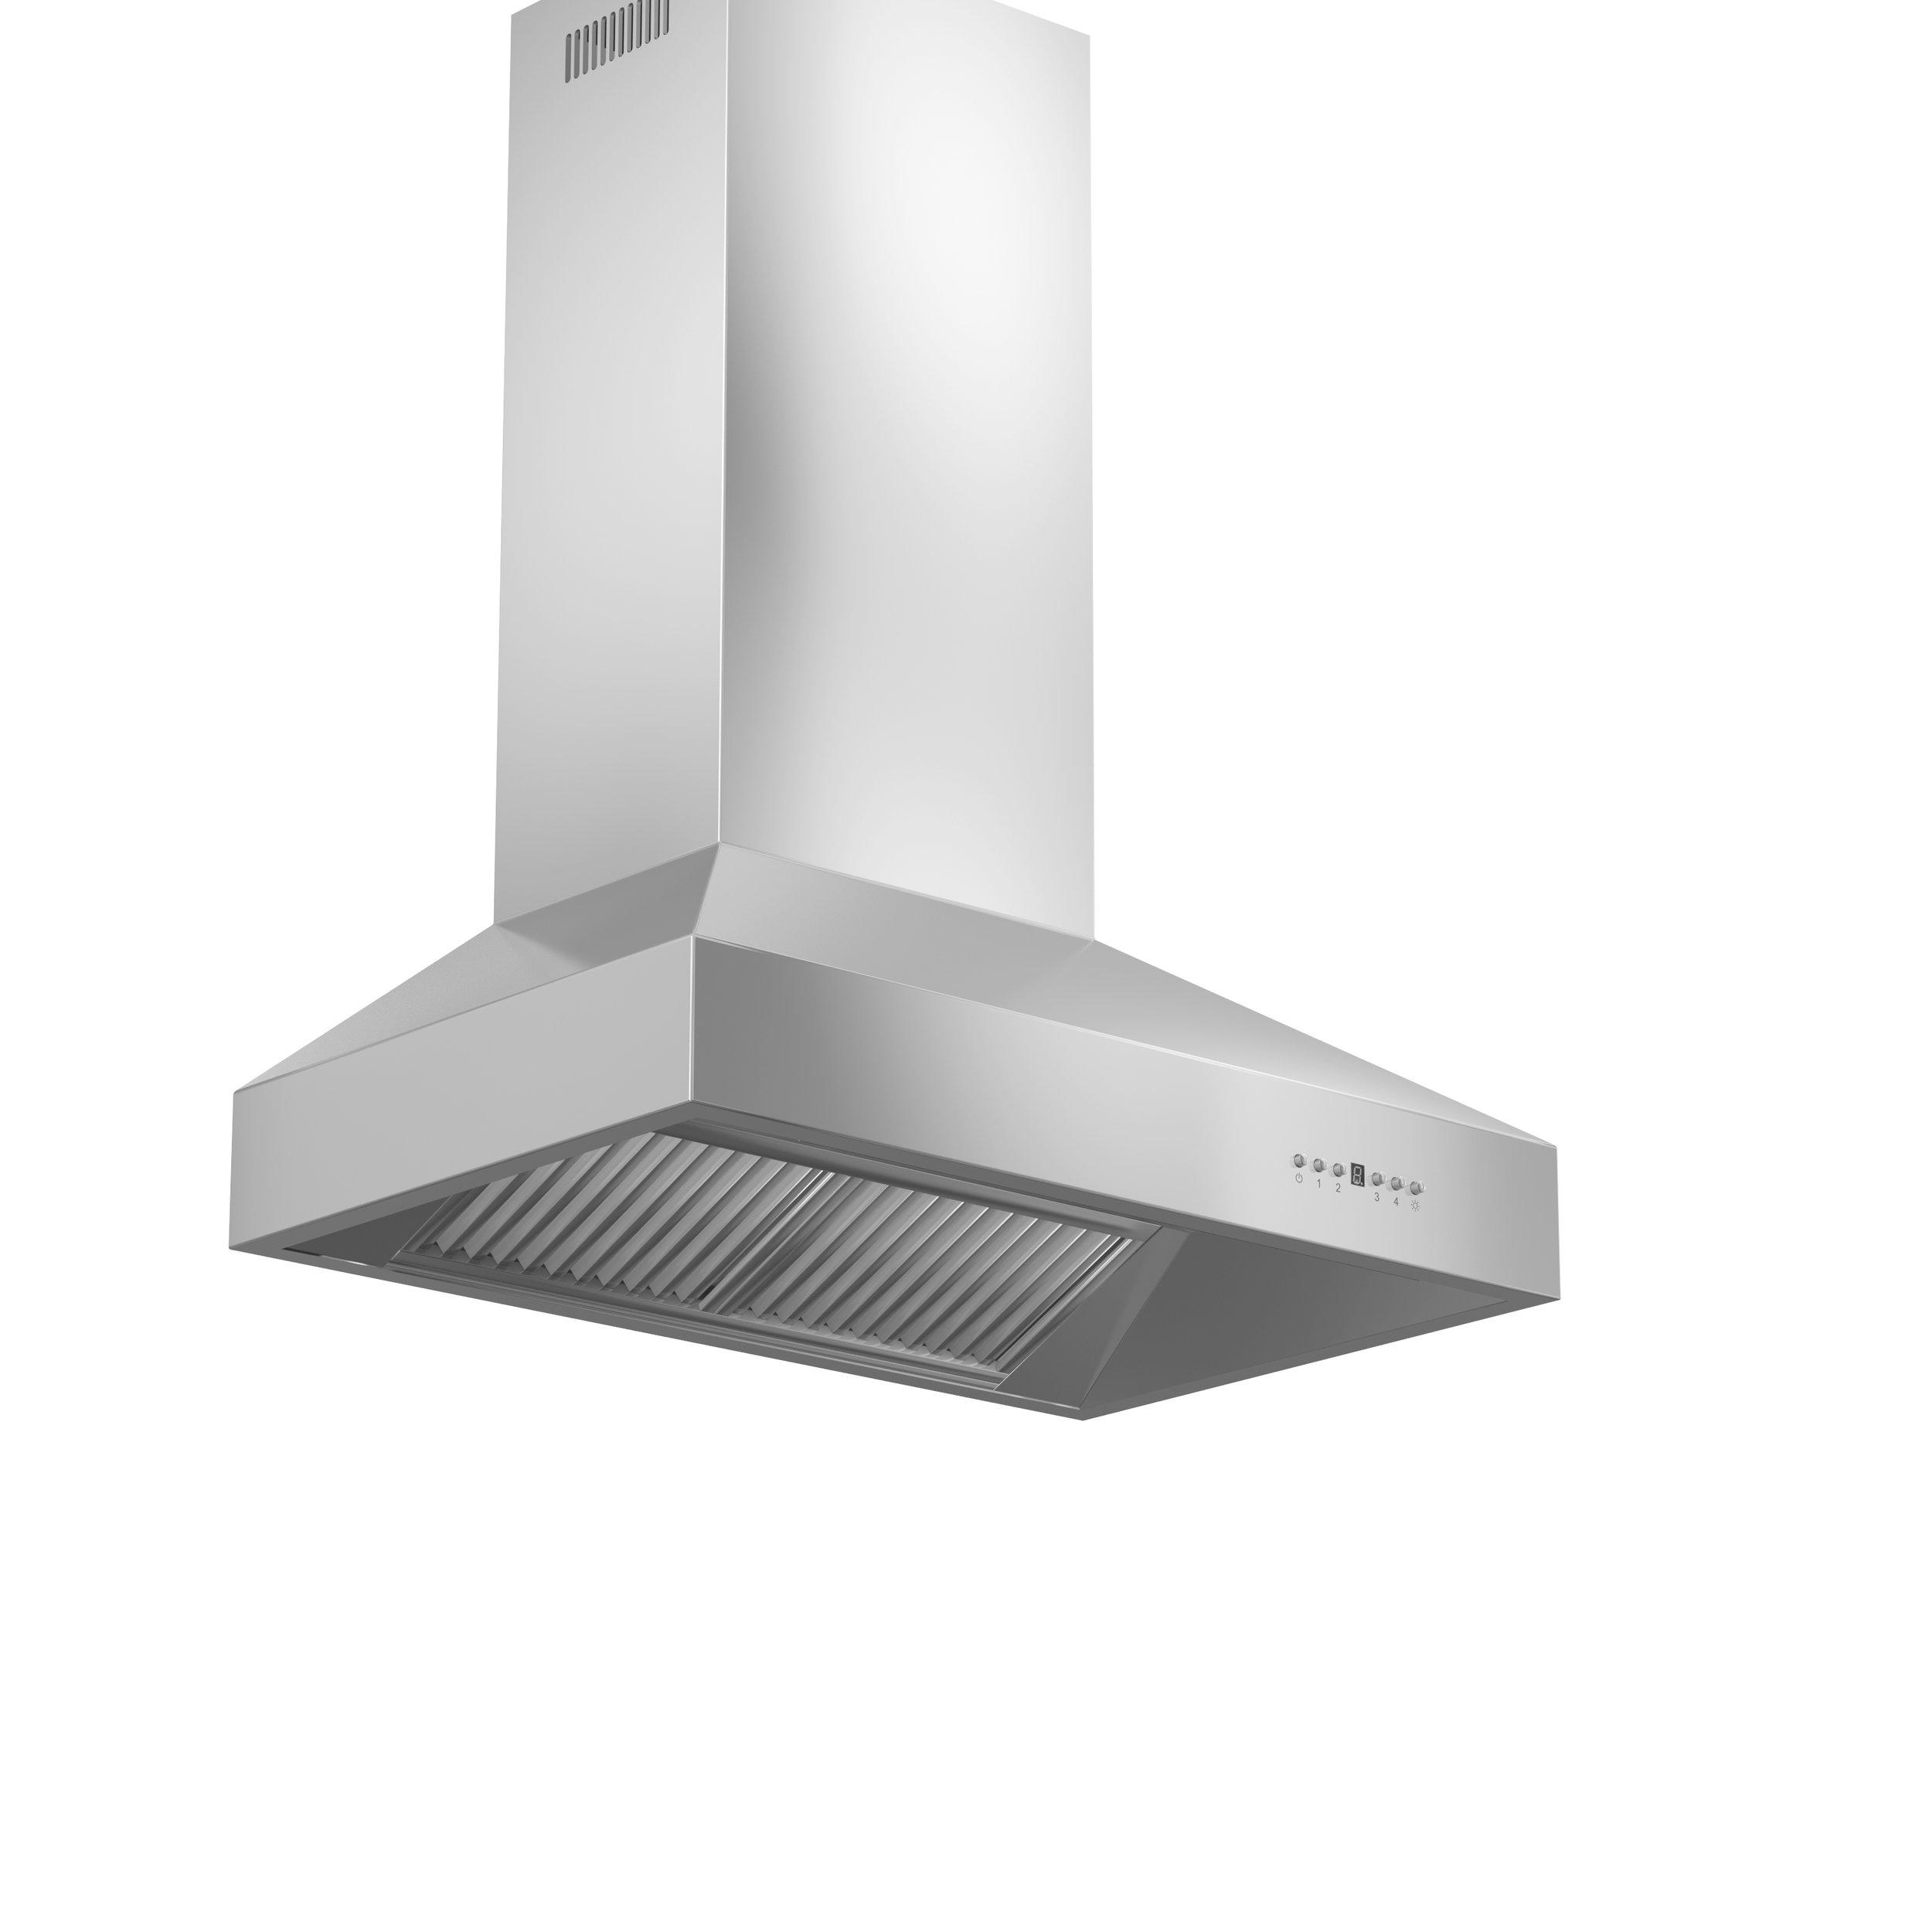 zline-stainless-steel-wall-mounted-range-hood-667-side-under.jpg